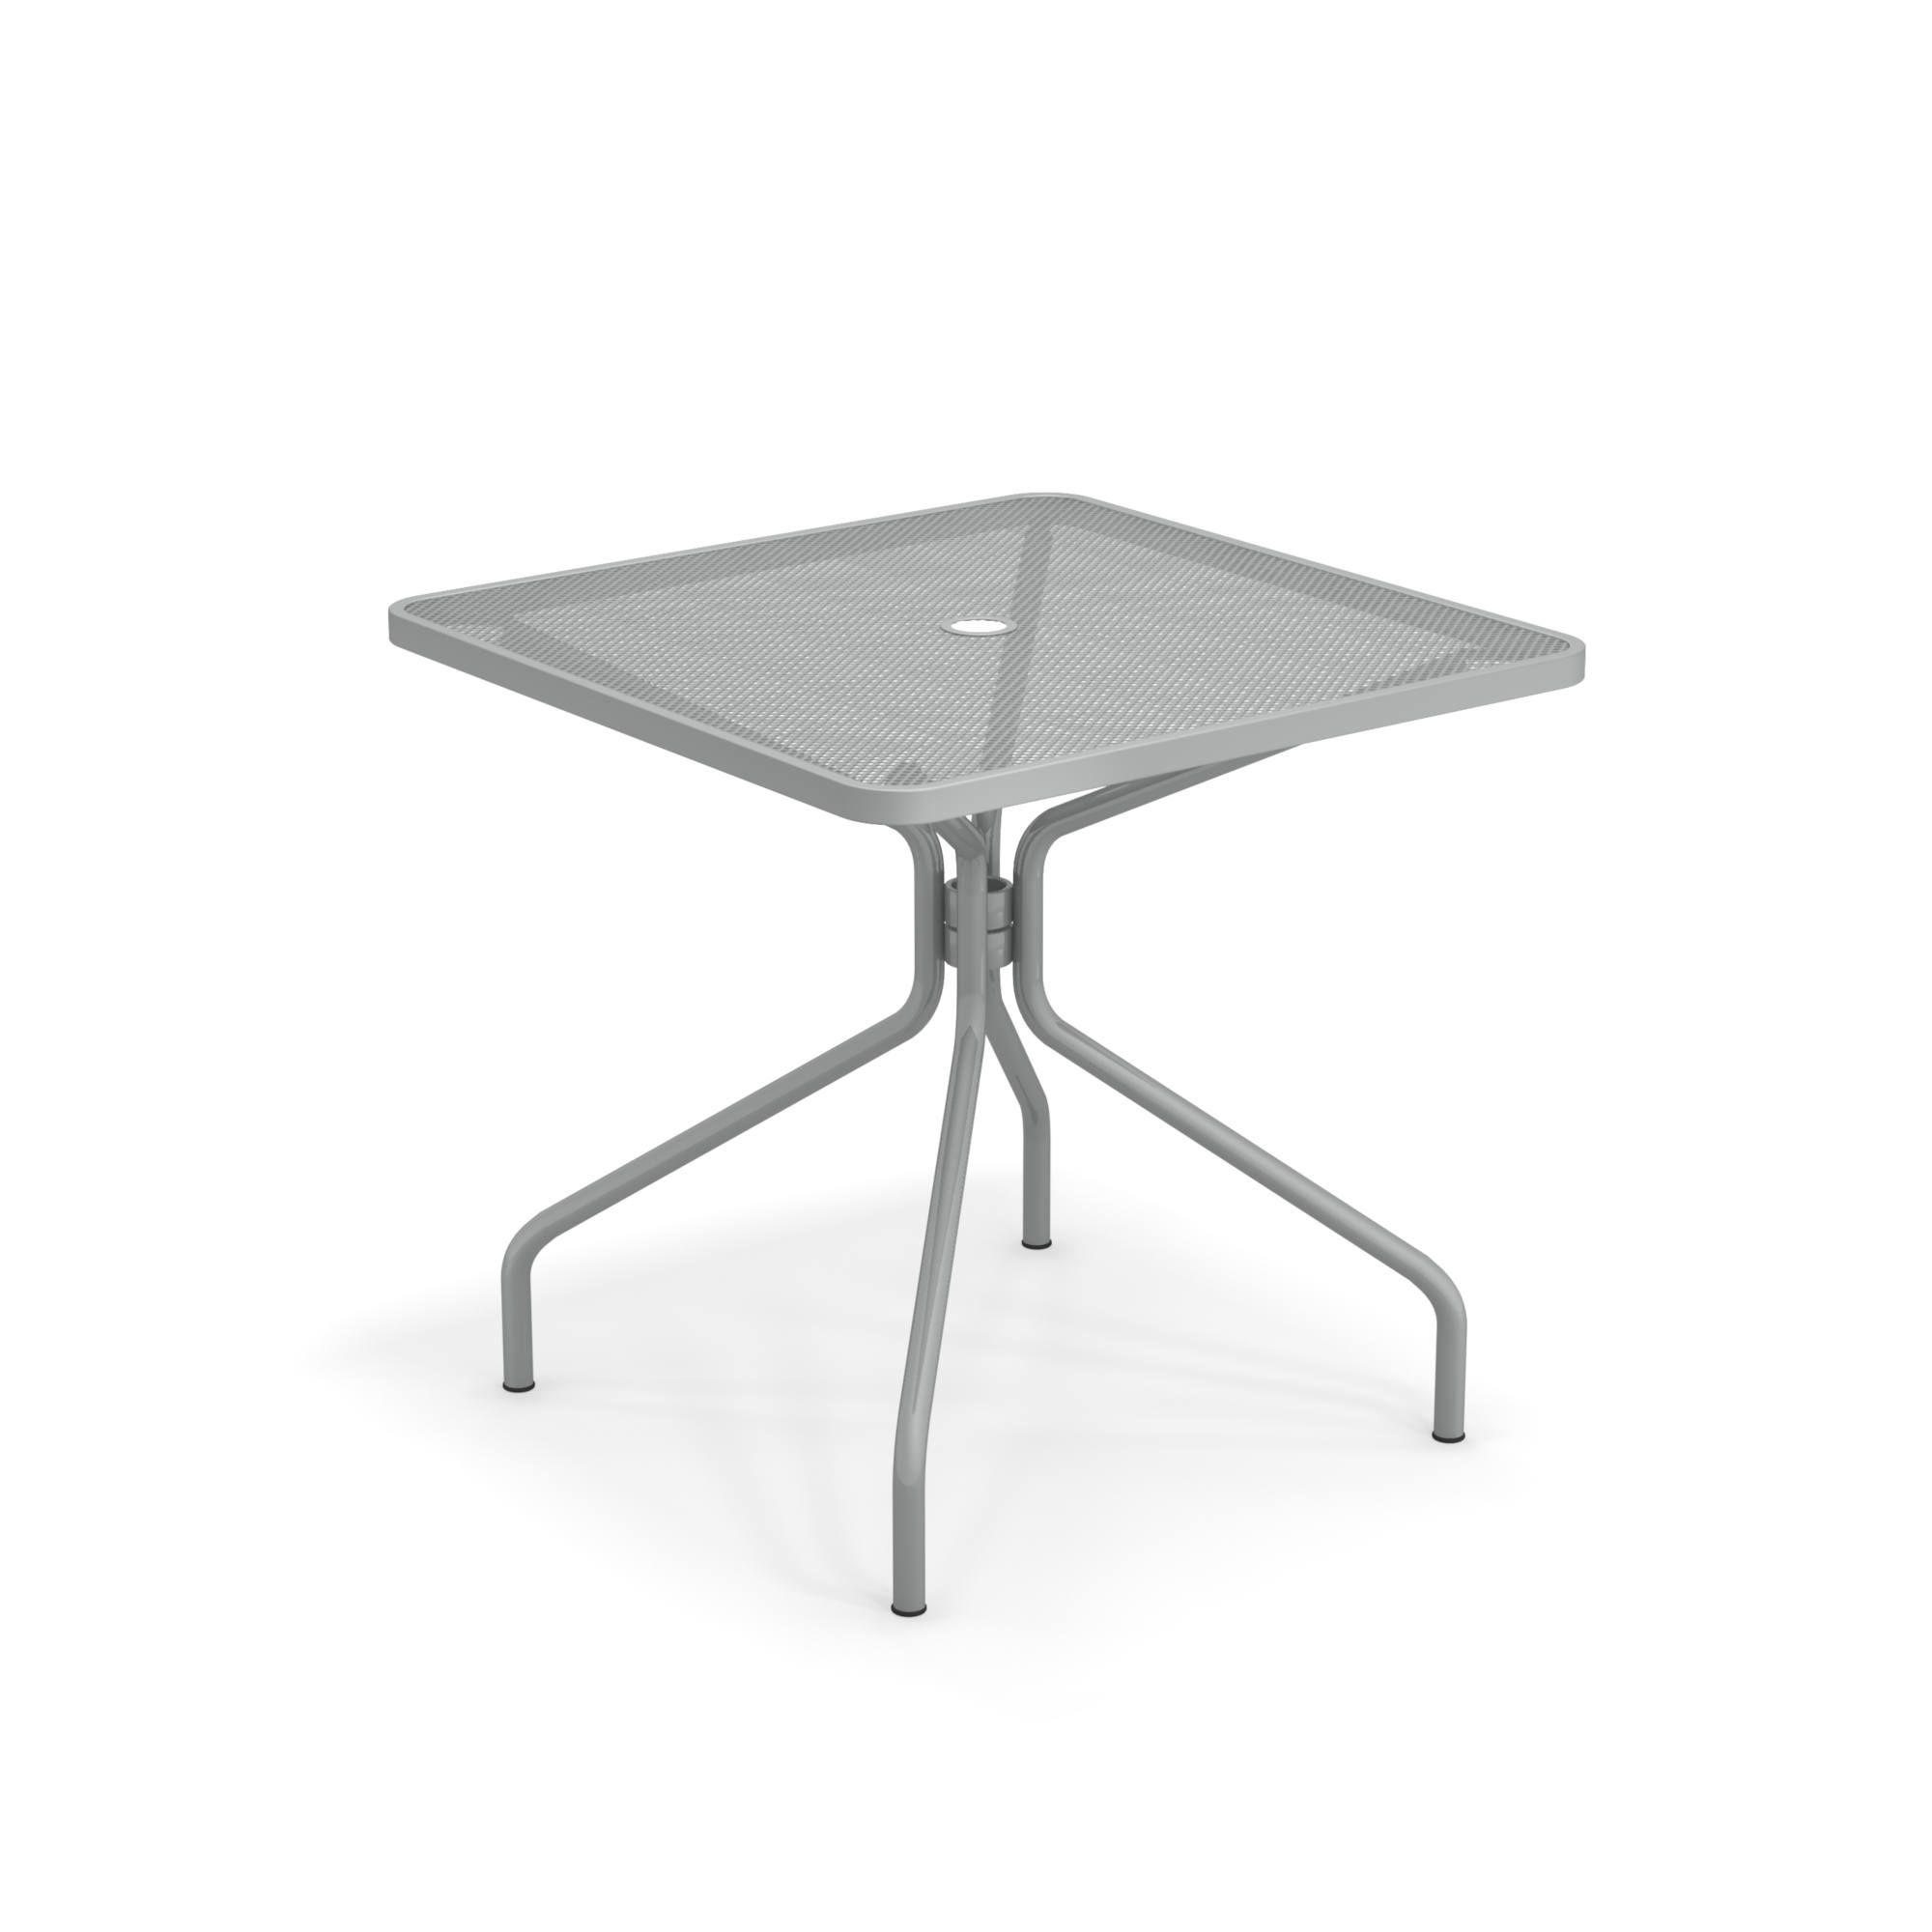 emuamericas, llc 801-20 table, outdoor